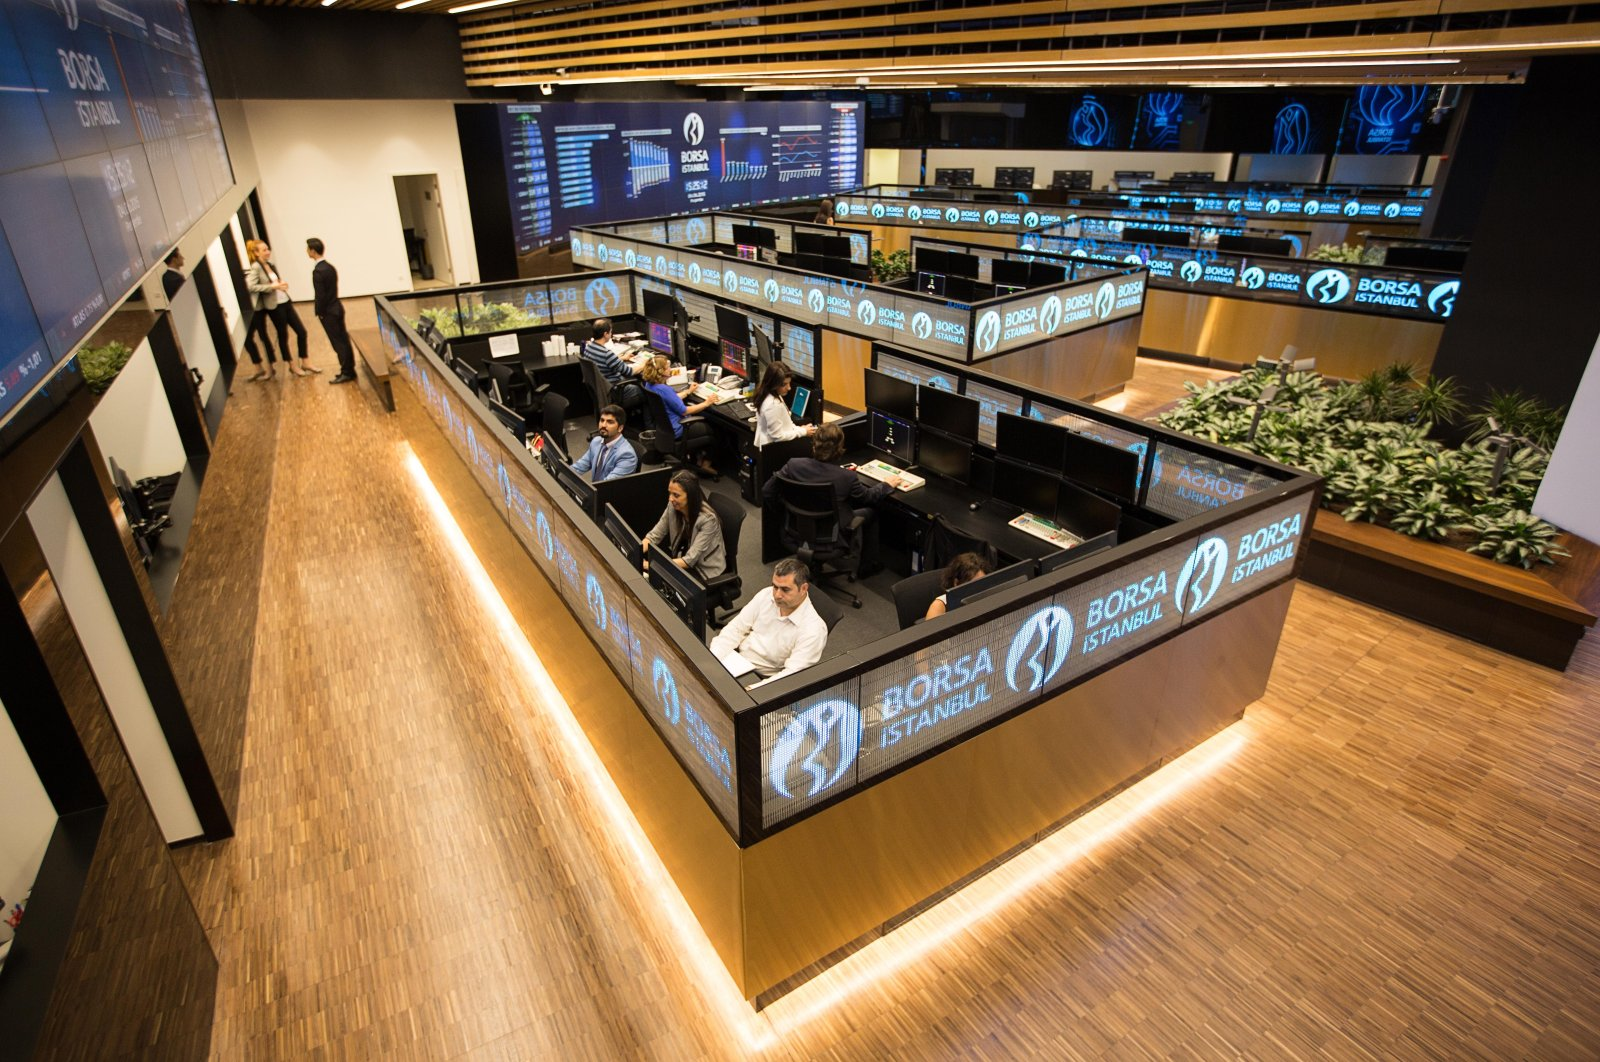 Traders work at their desks on the floor of Borsa Istanbul, Istanbul, Turkey, July 27, 2020. (IHA Photo)